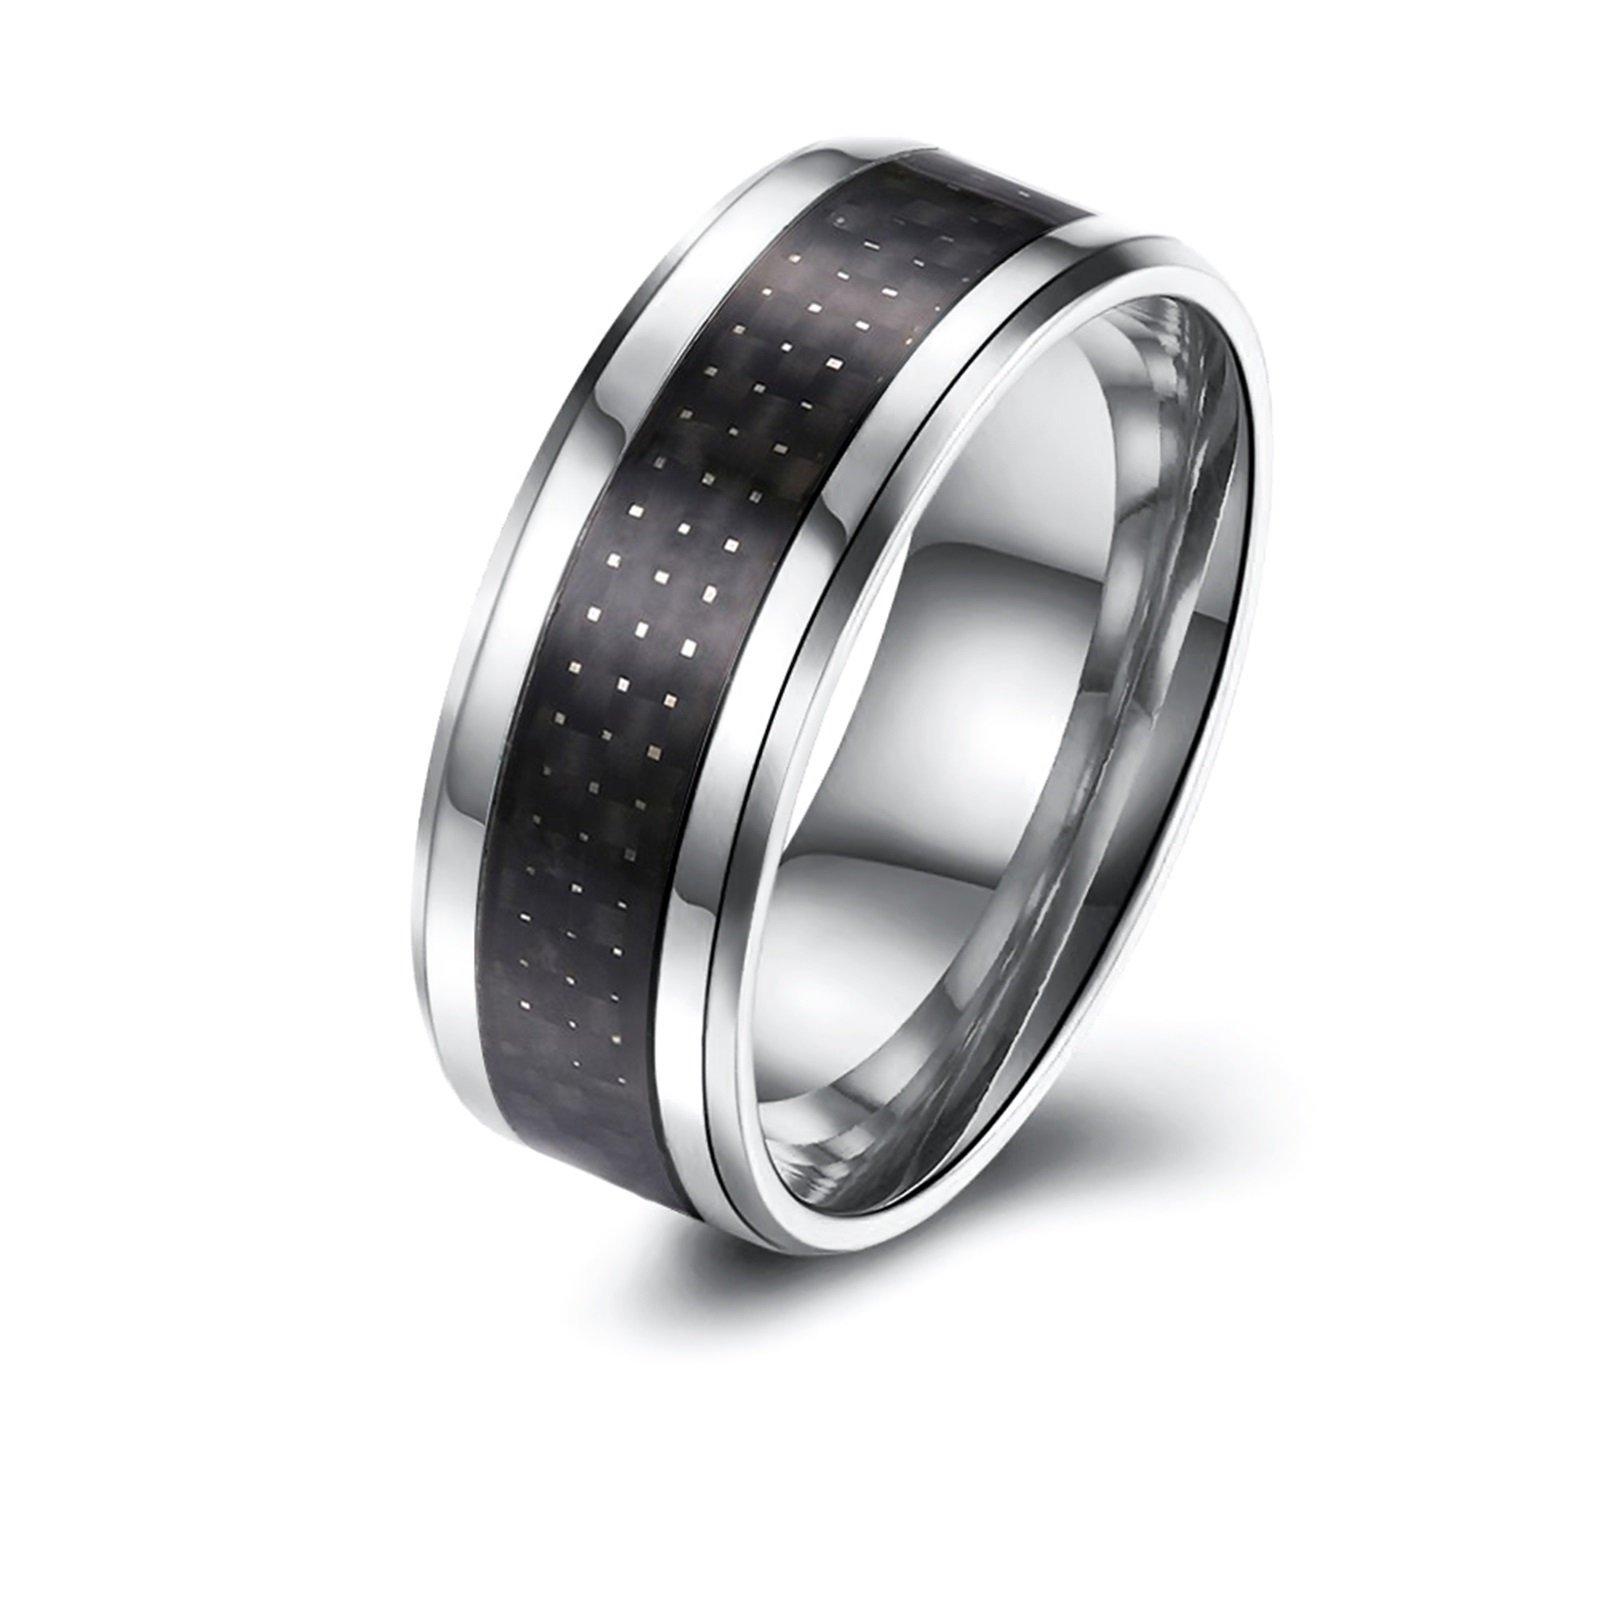 Epinki 8MM Black Carbon Fiber Stainless Steel Carbide Wedding Band Ring Polished Finish Size 10 Men Accessories